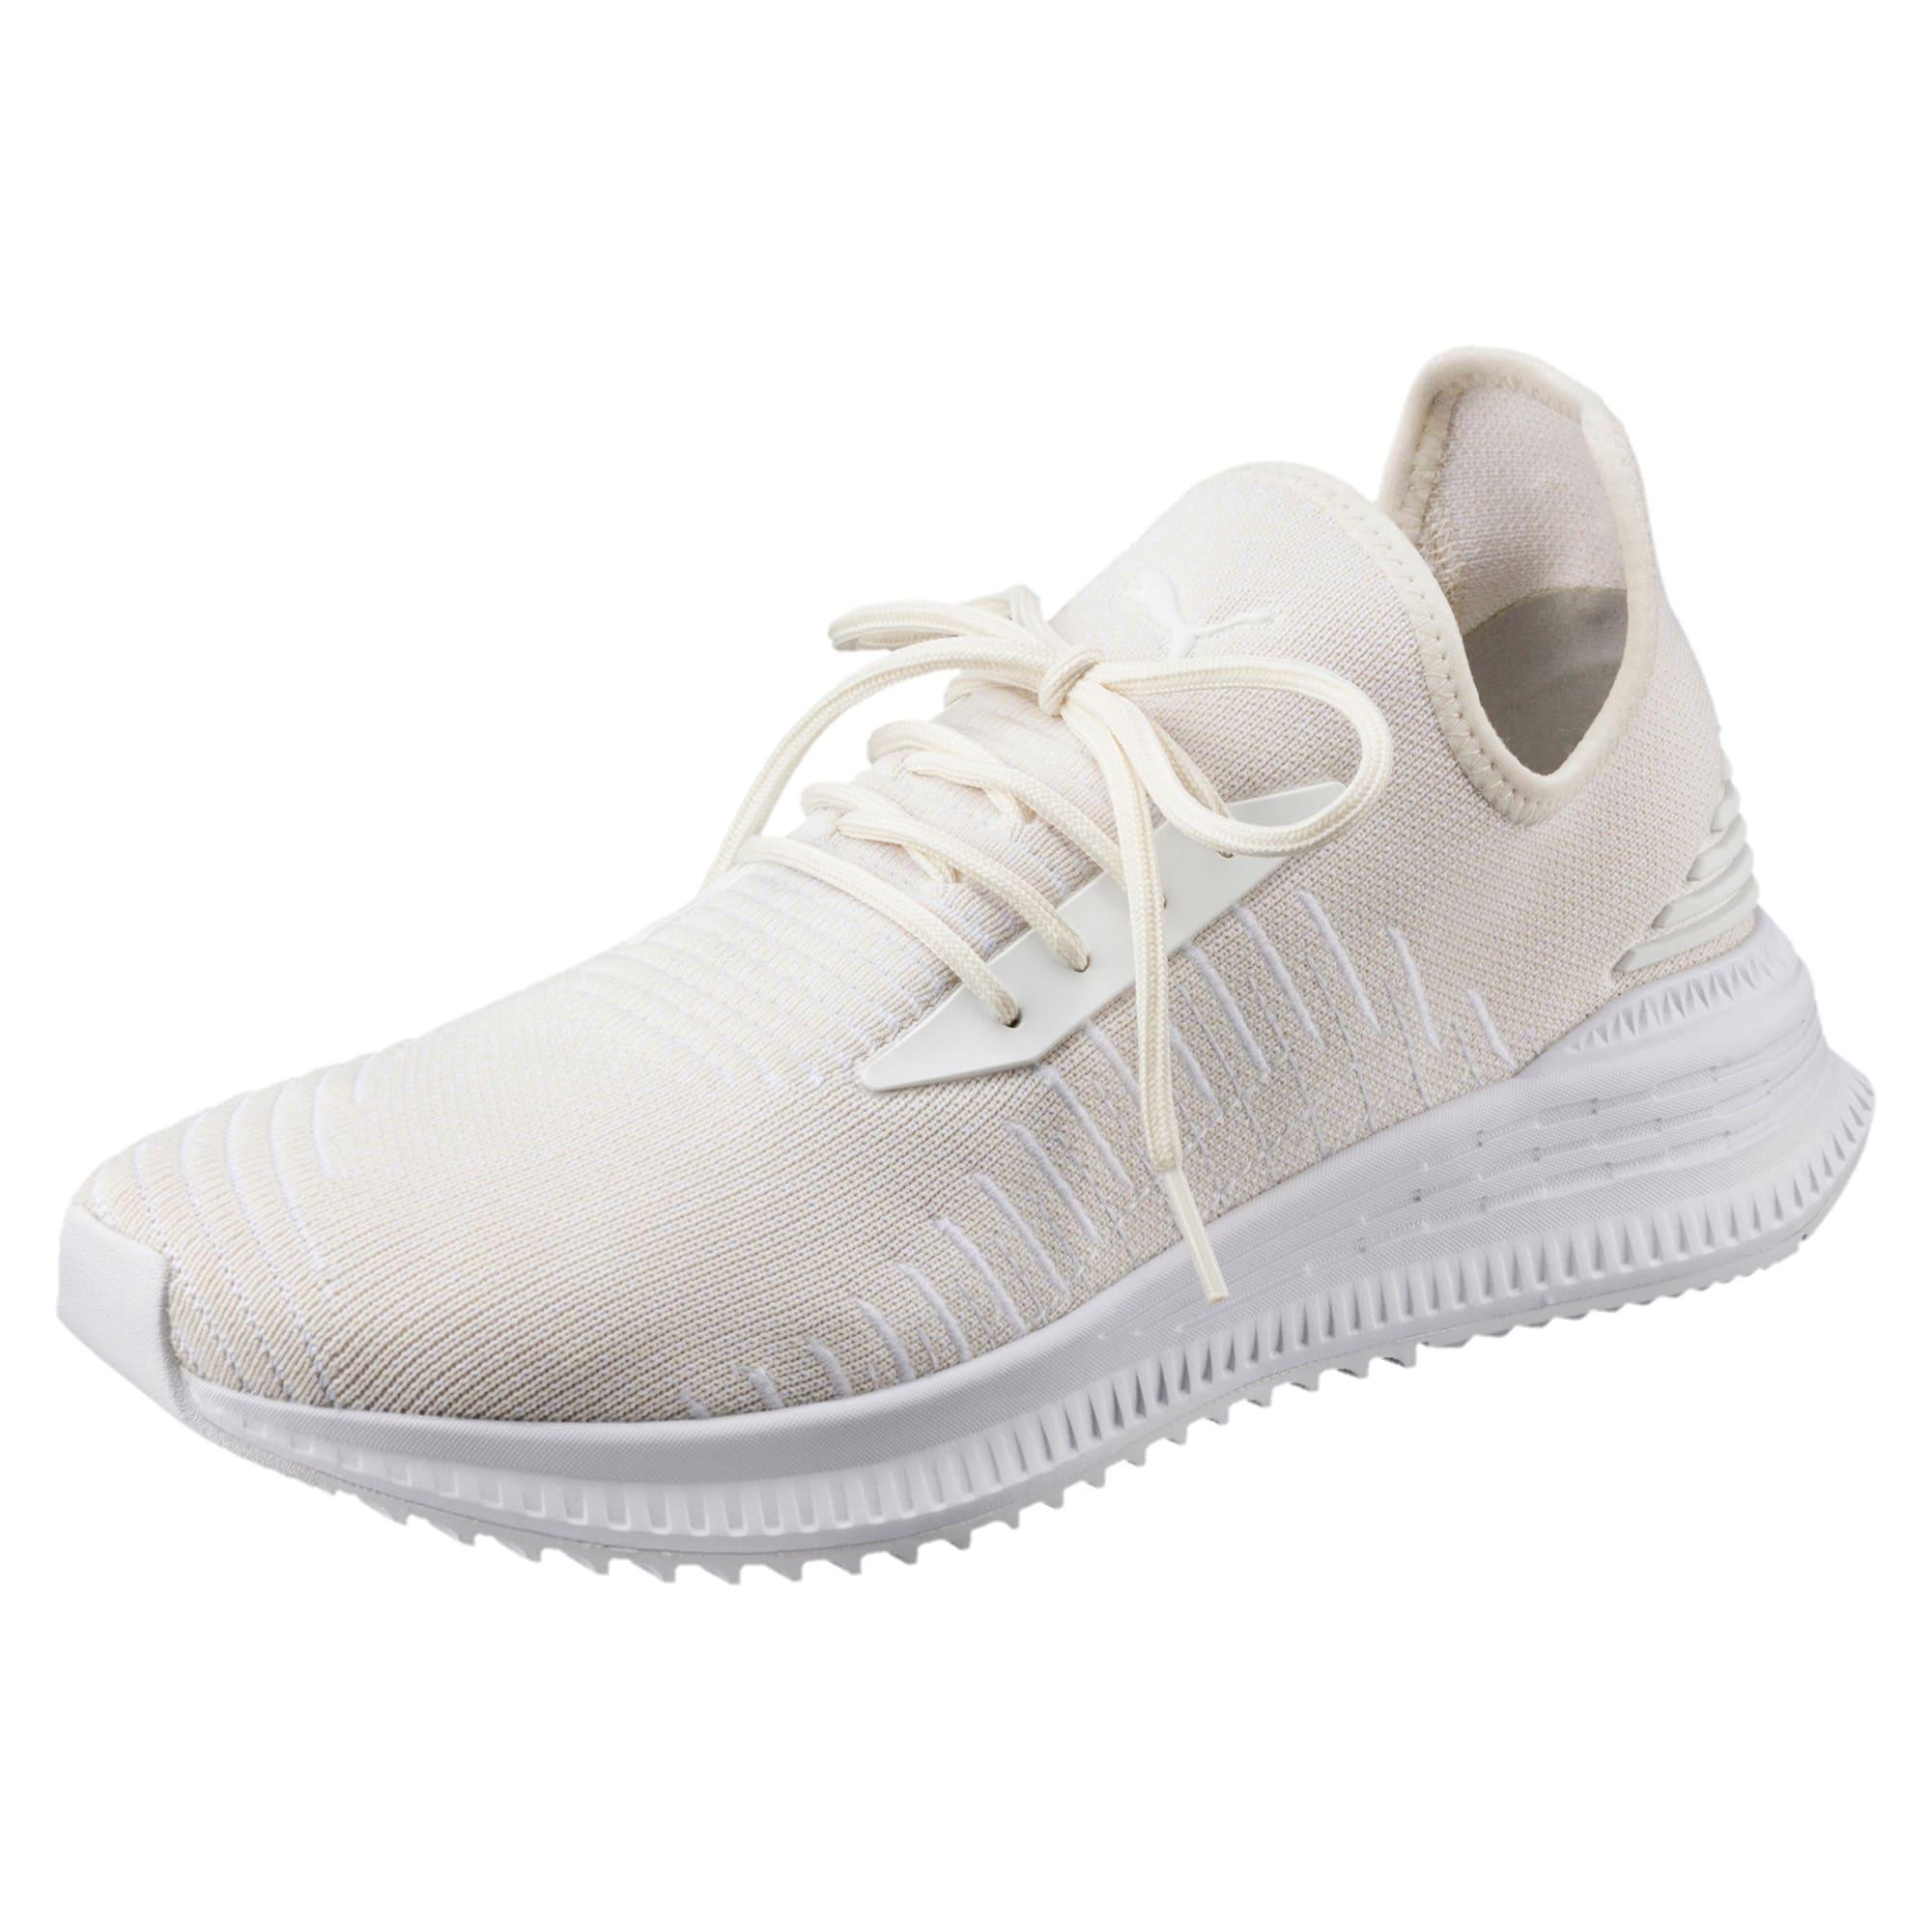 Thumbnail 1 of AVID Men's Sneakers, Whisper White-Puma White, medium